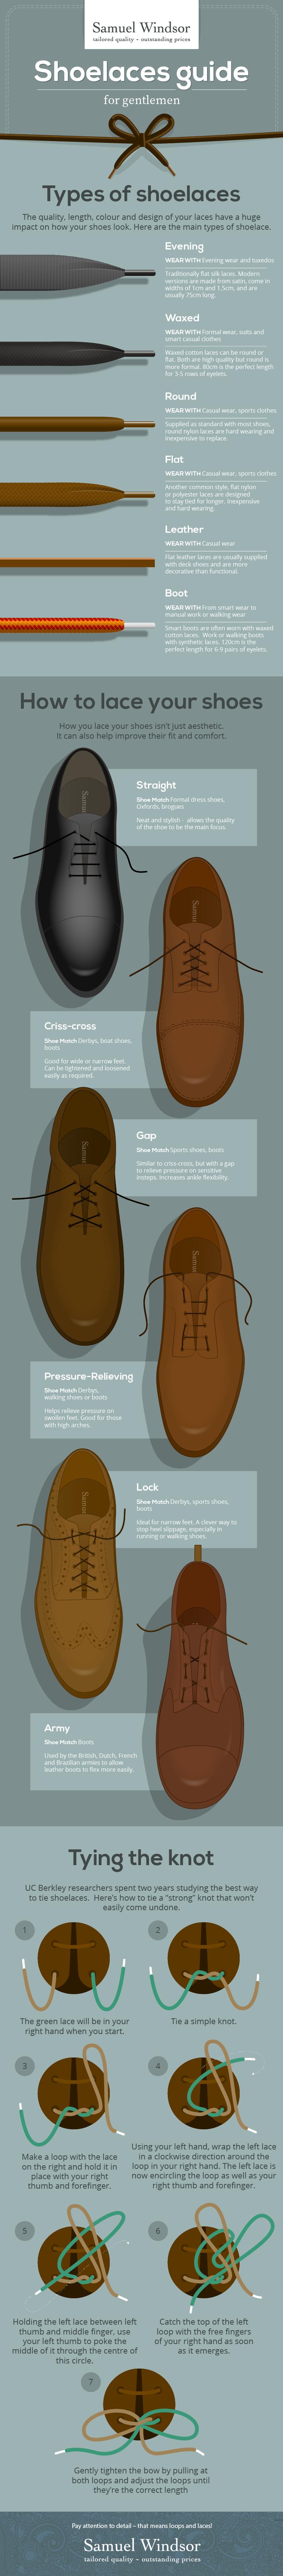 Shoelace Guide for Gentlemen